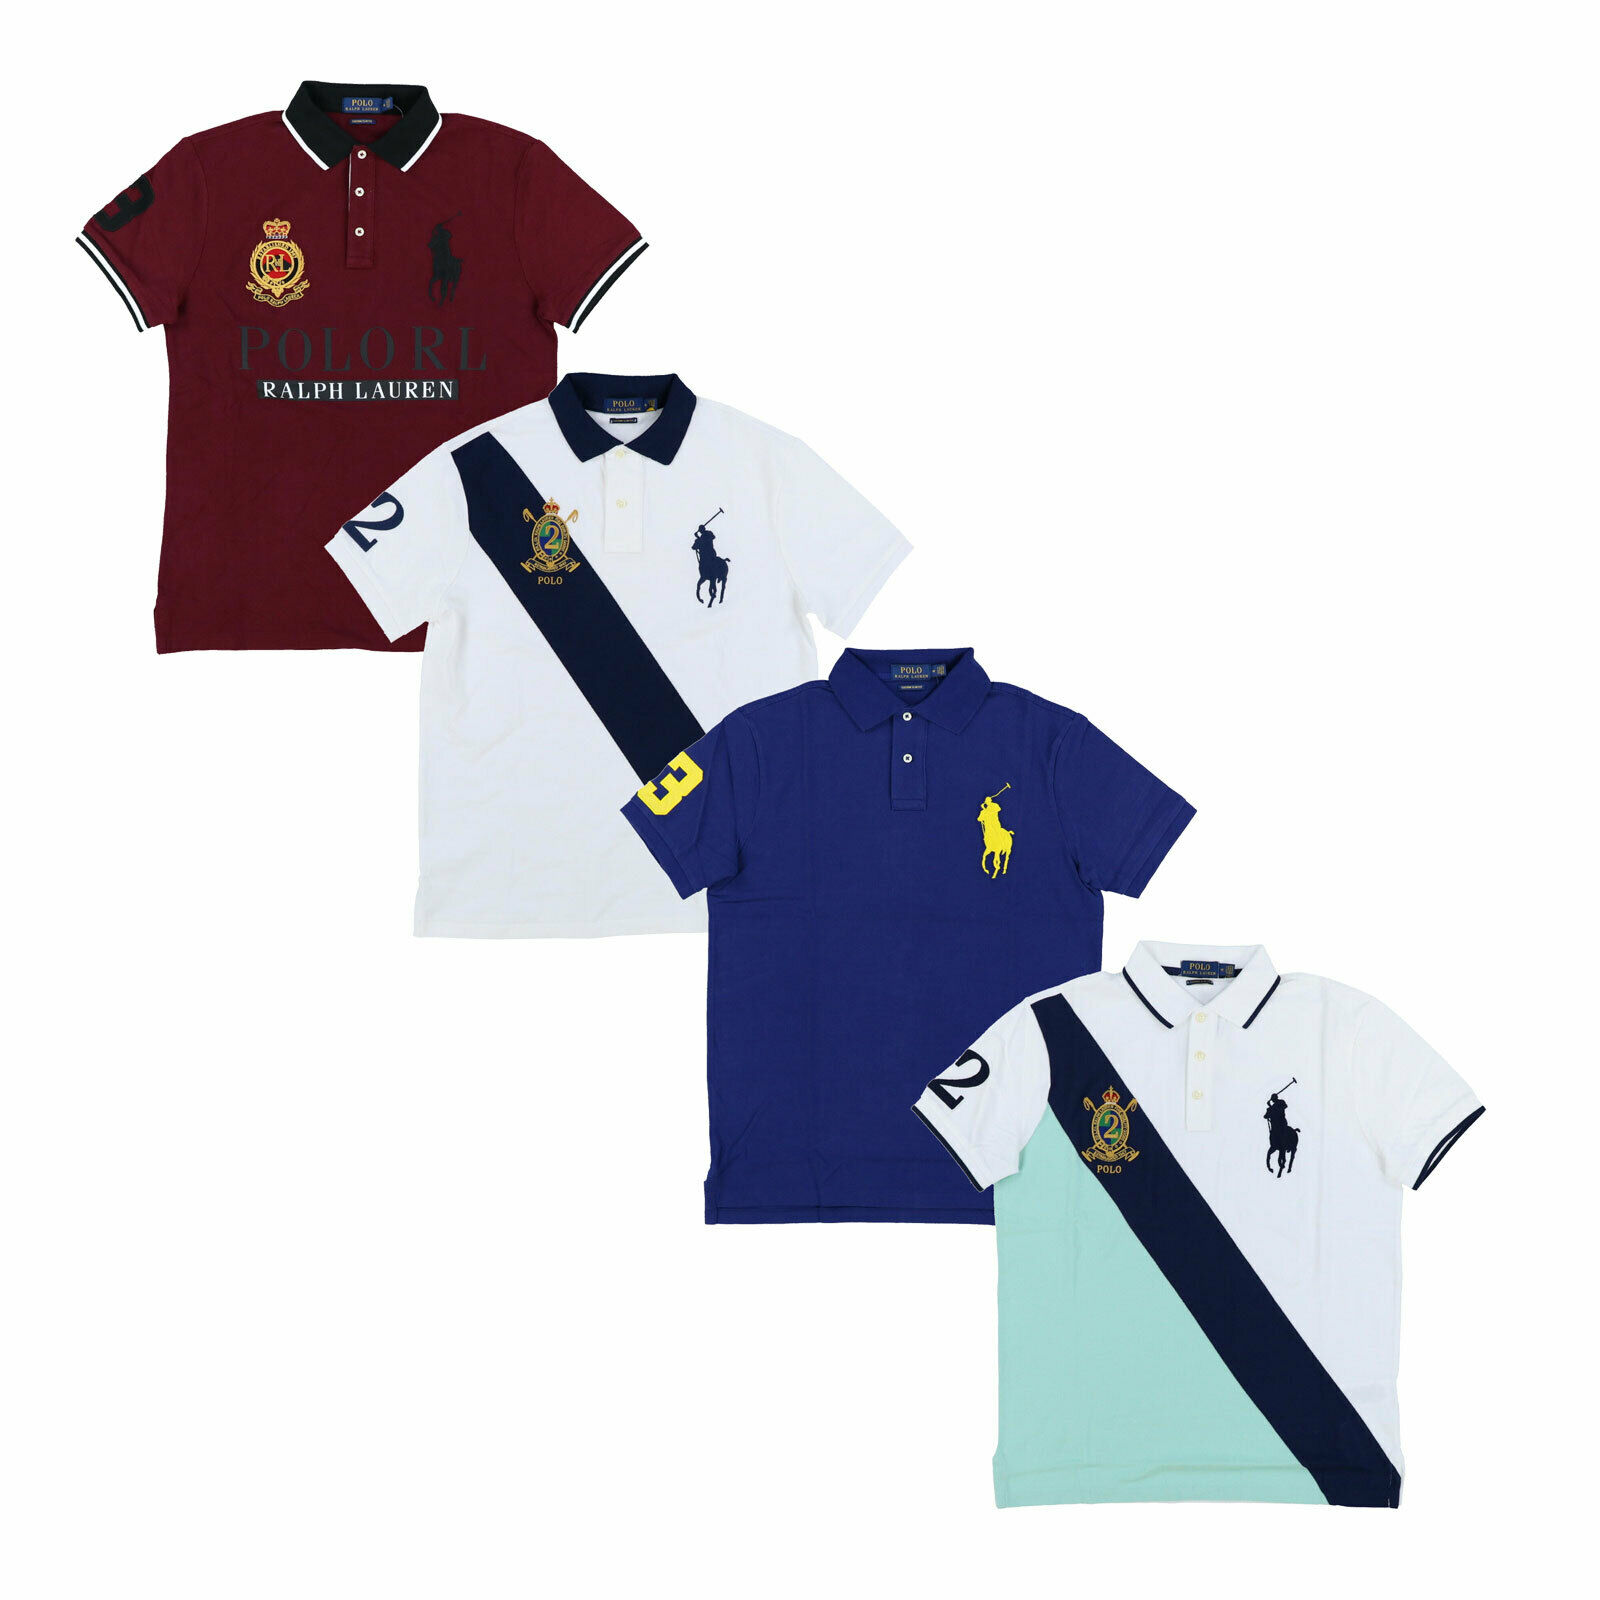 4a44d1f4cf Polo Ralph Lauren Big Pony Custom Slim Fit Polo Shirt Mesh Knit Xs S M L Xl  Xxl